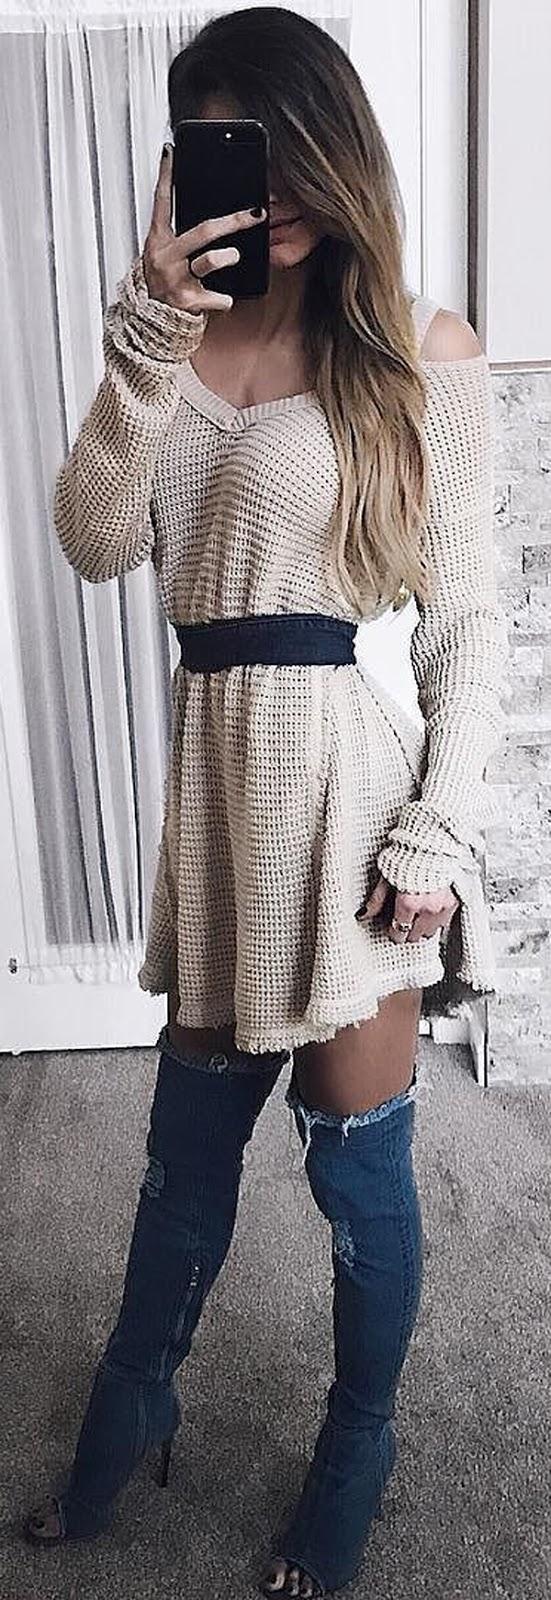 skinny style